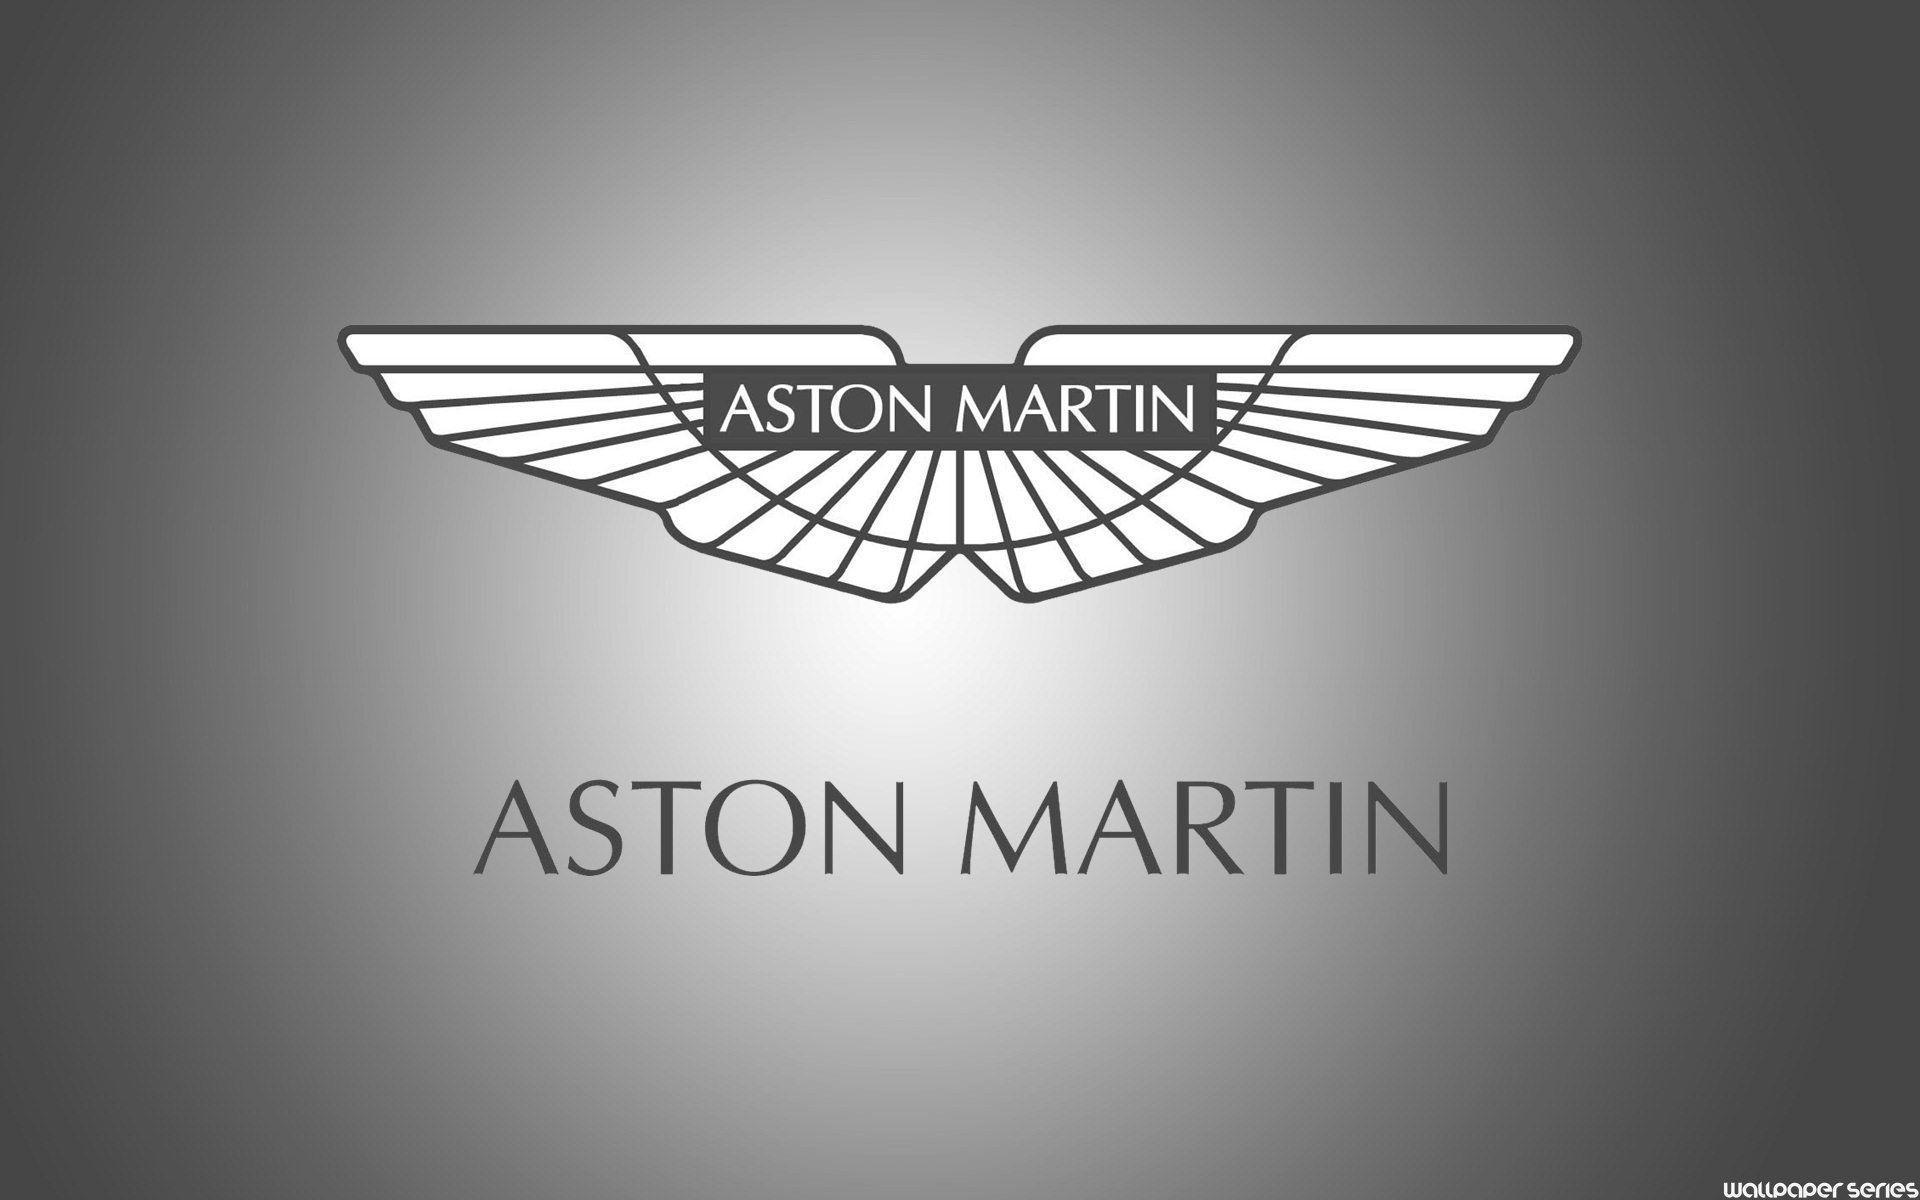 aston martin logo wallpapers wallpaper cave. Black Bedroom Furniture Sets. Home Design Ideas